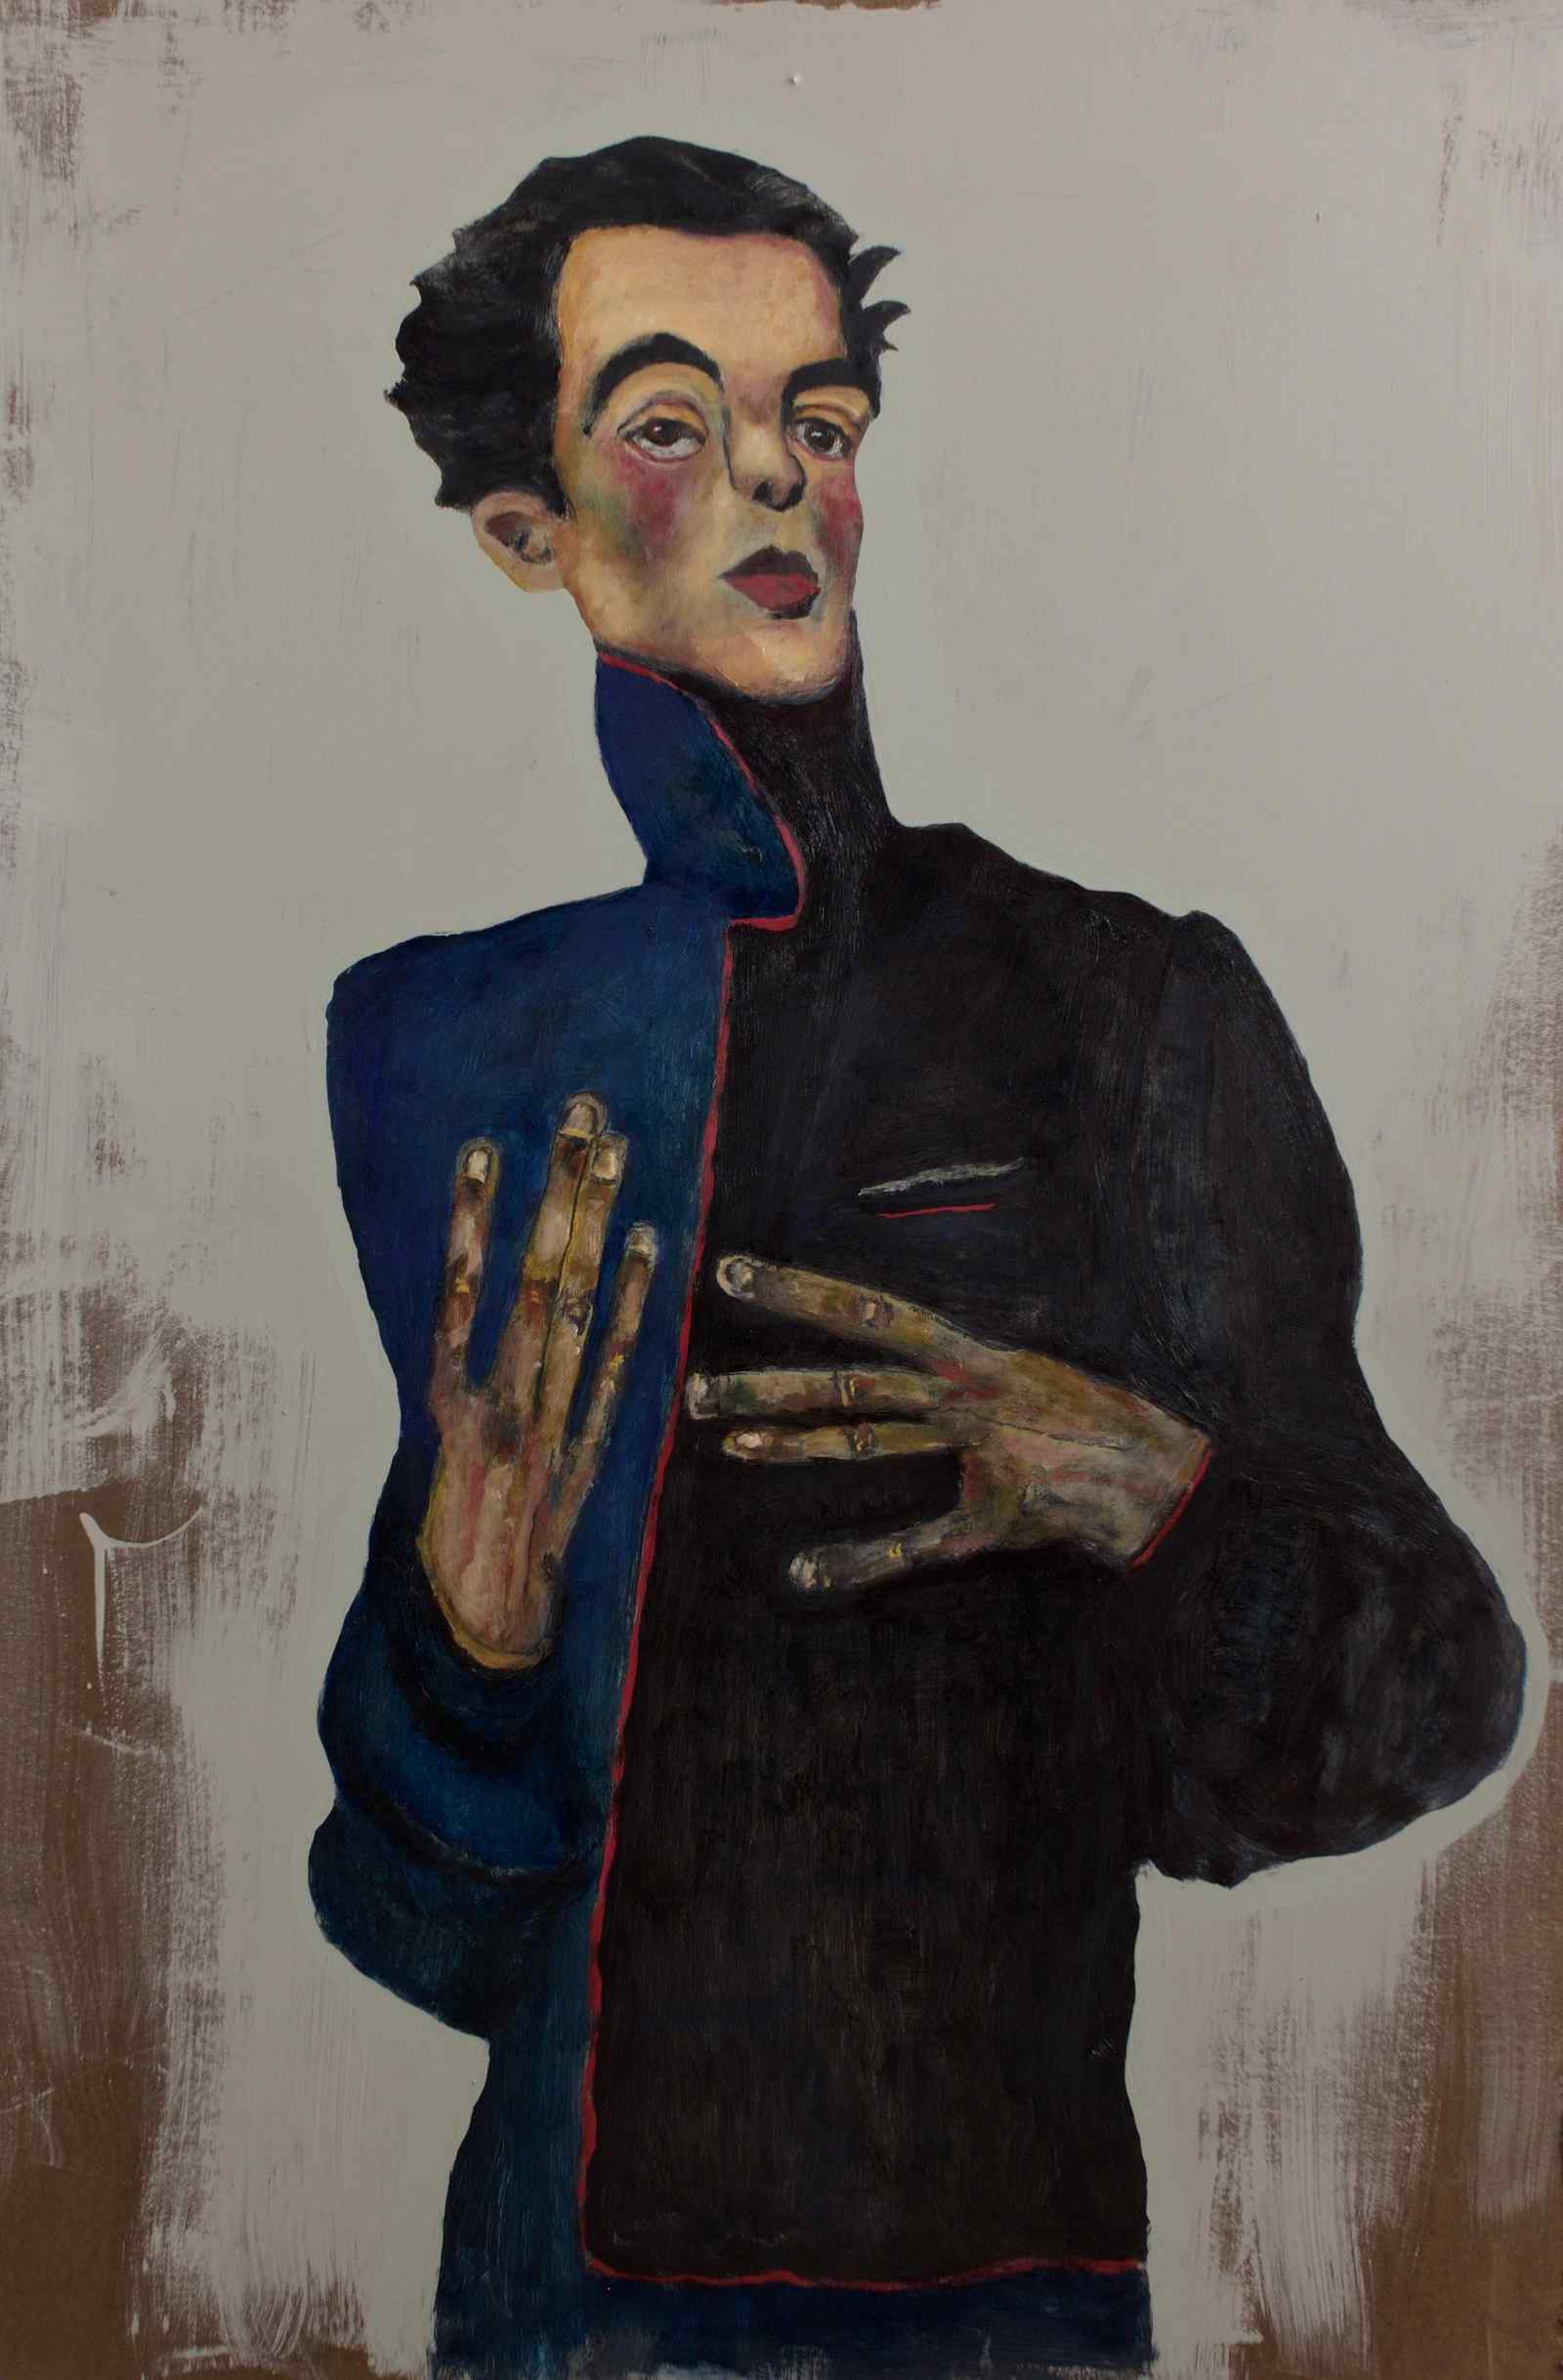 Woodrow Schiele